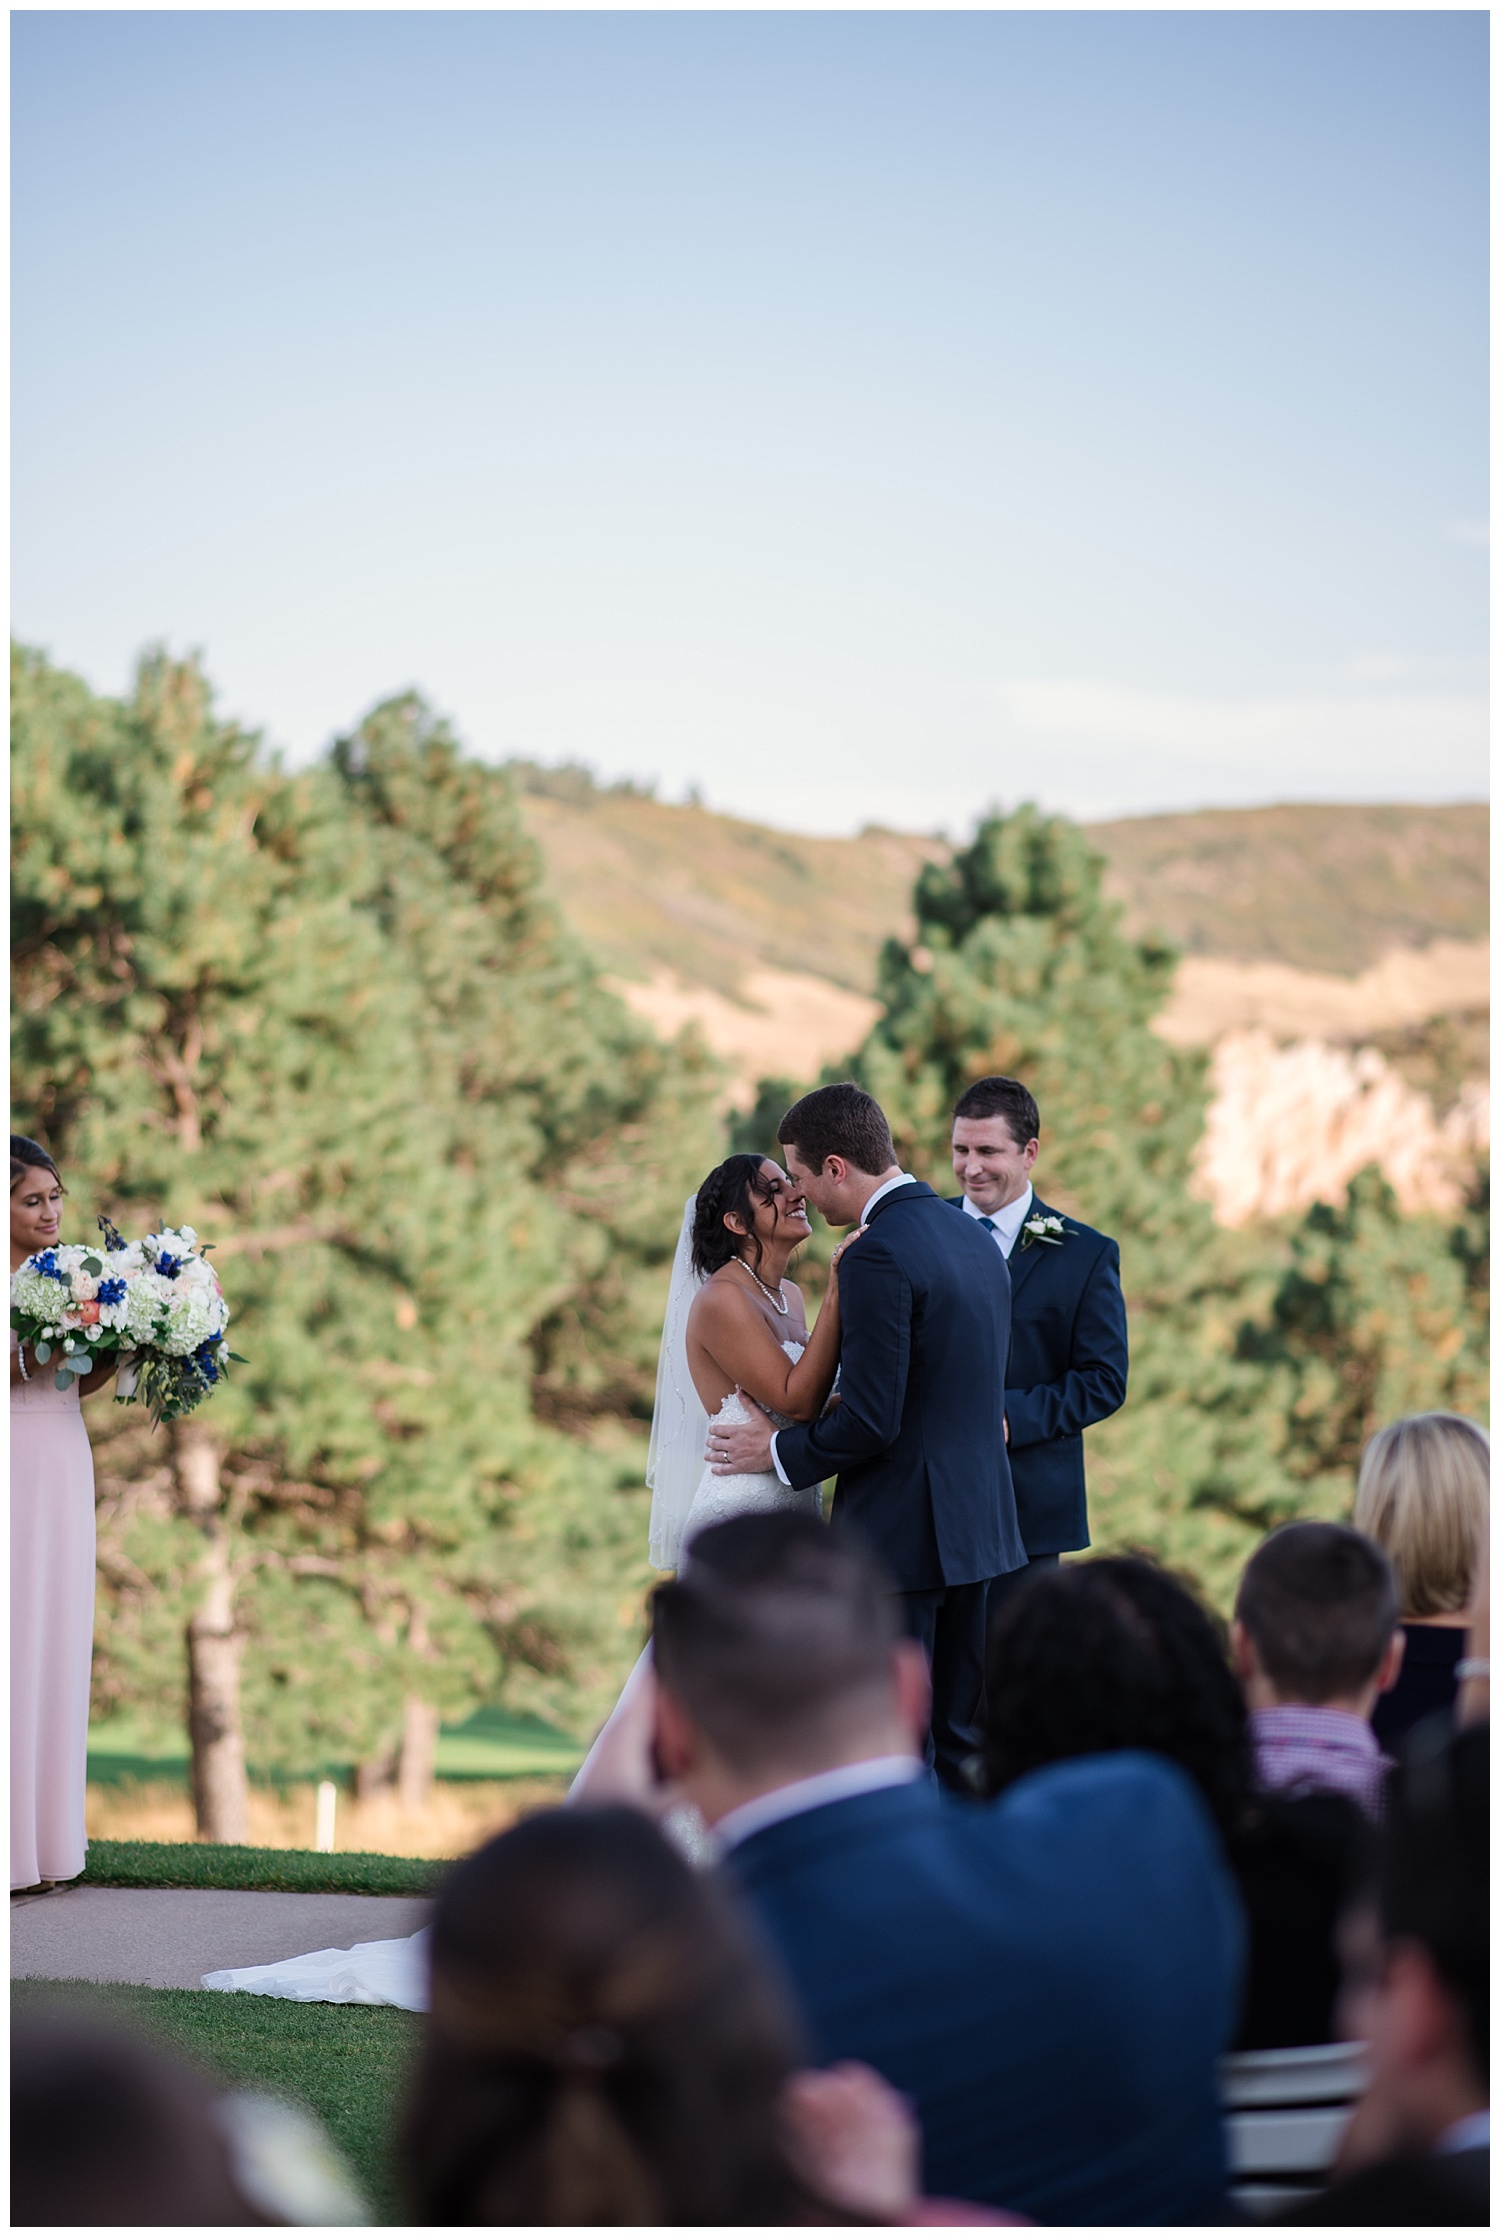 Wedding at Arrowhead Golf Course, Red Rocks Wedding, Small Colorado Wedding Photographer, Colorado Wedding Photographer, Denver Wedding Photographer, Denver Colorado Wedding Photographer, wedding photographer denver, downtown denver wedding photographer, country club wedding denver